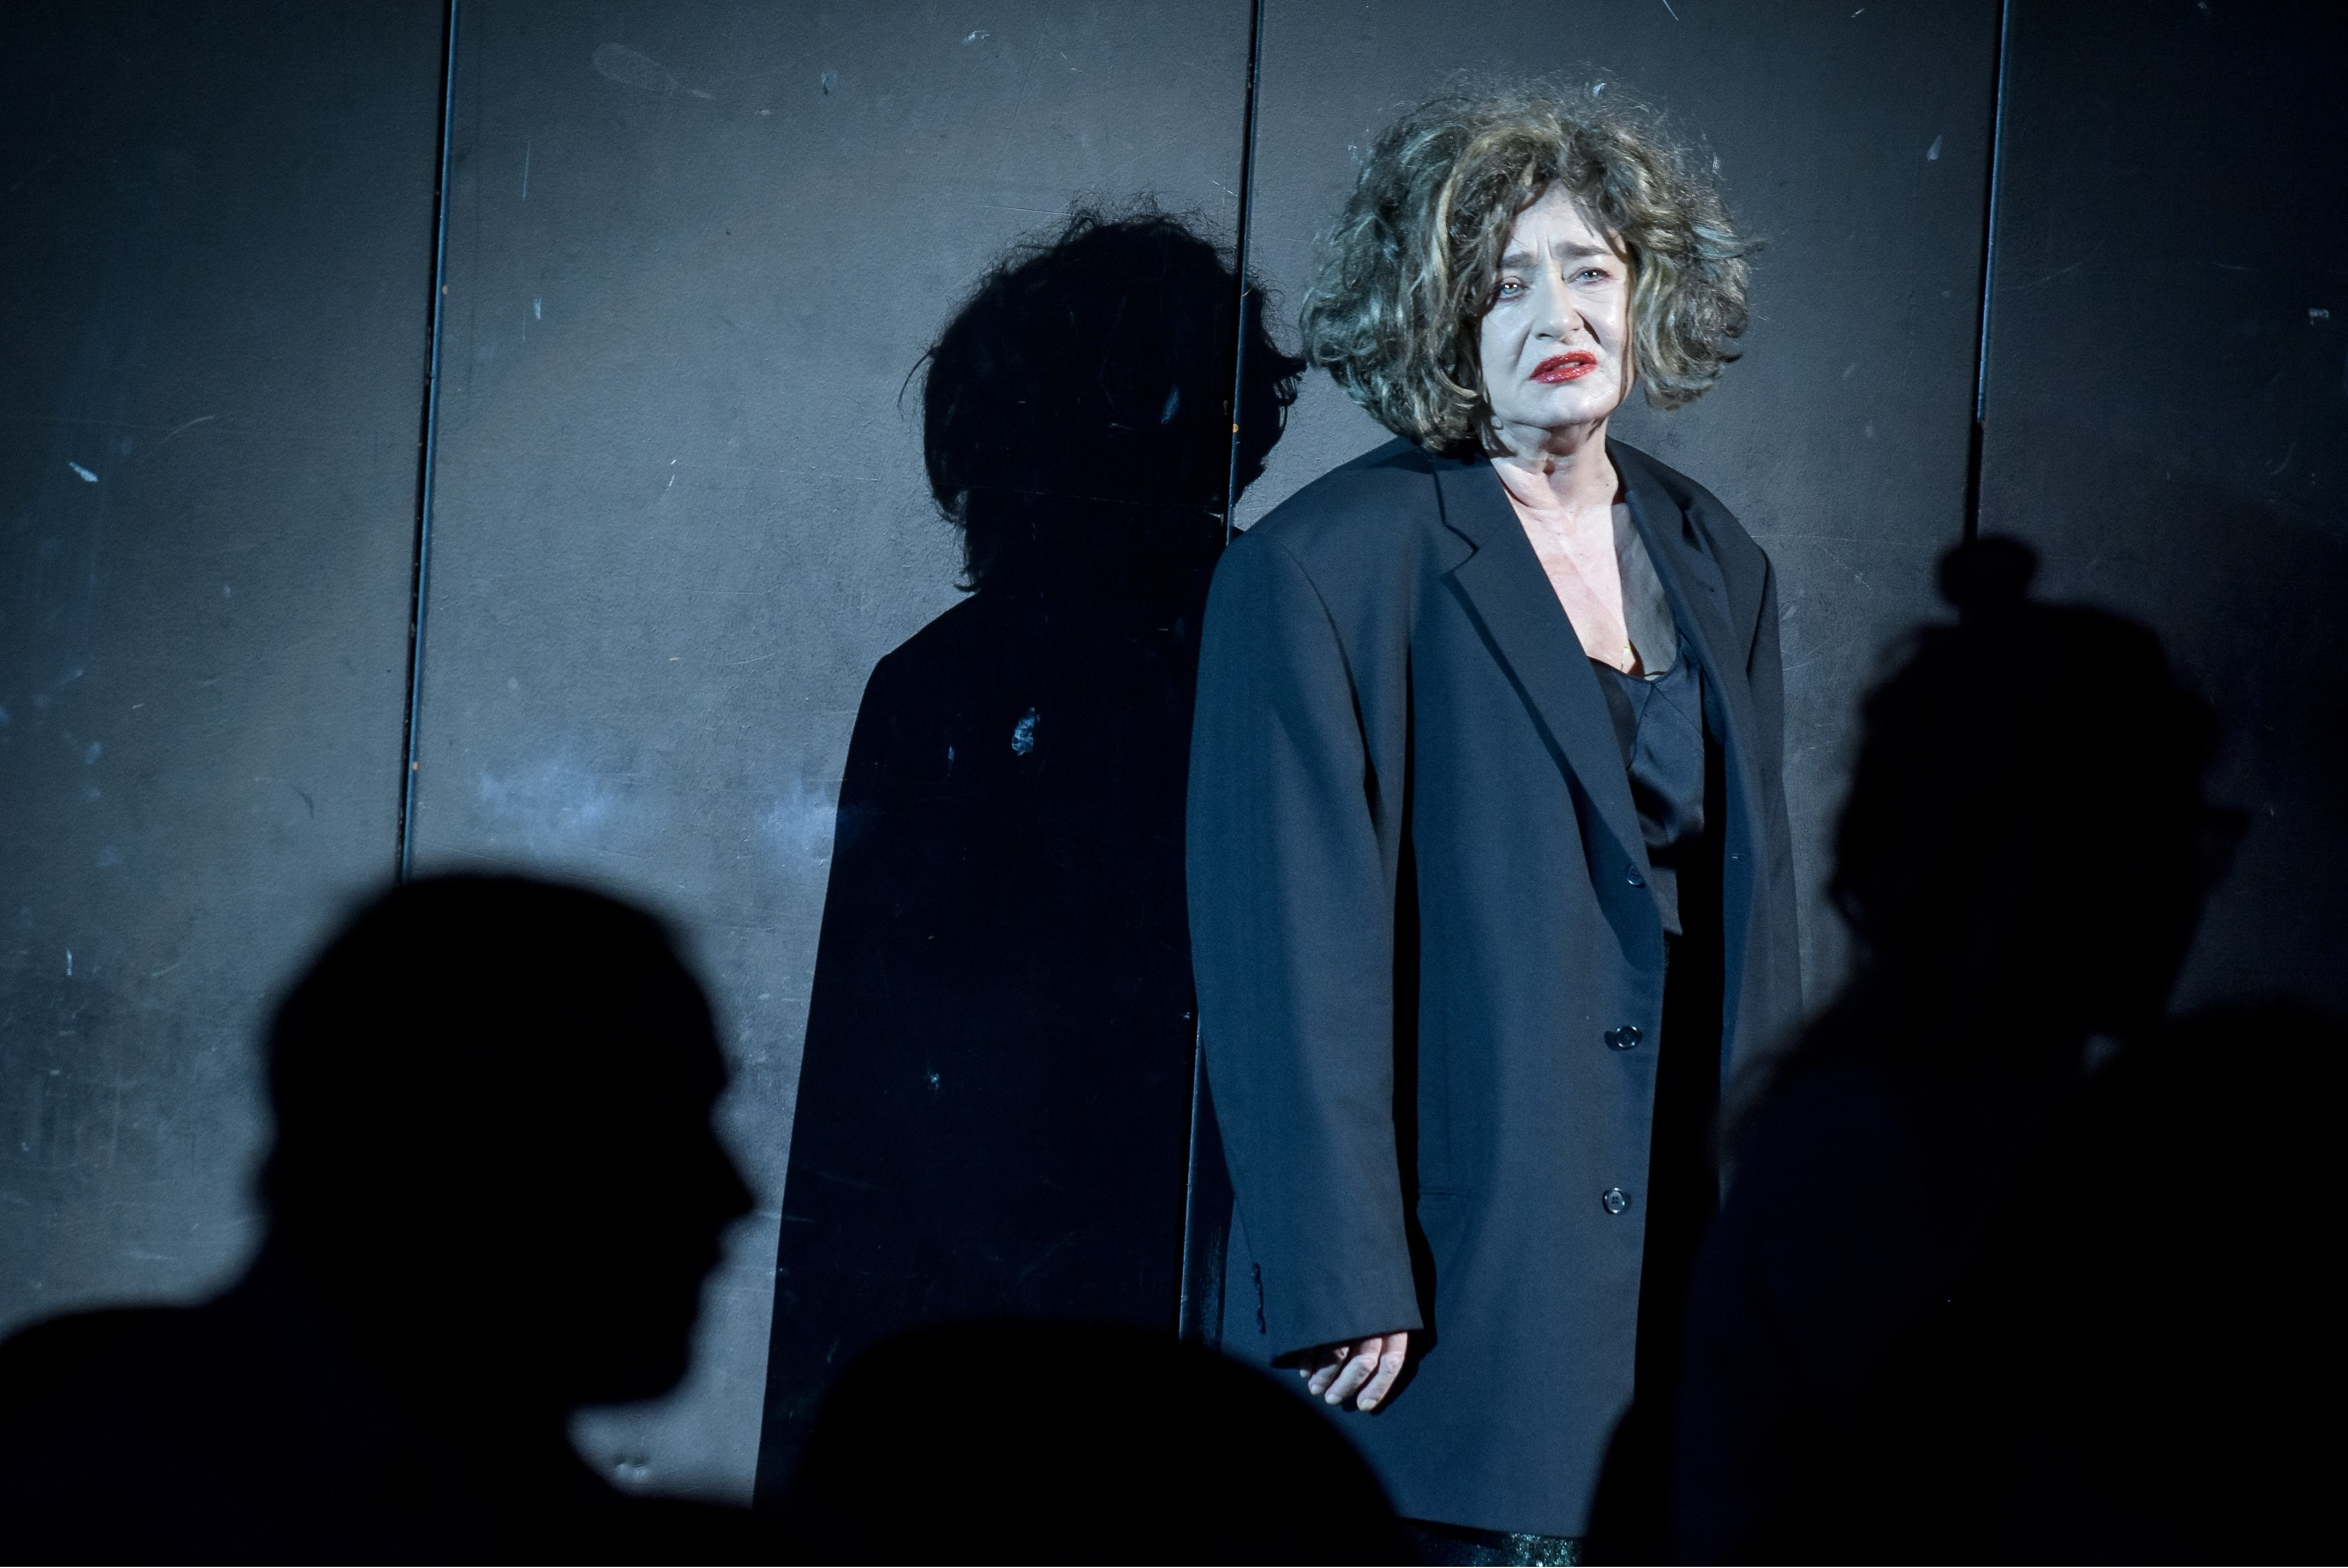 Richard III Regie: Jan Bosse Mechthild Großmann Foto: Arno Declair